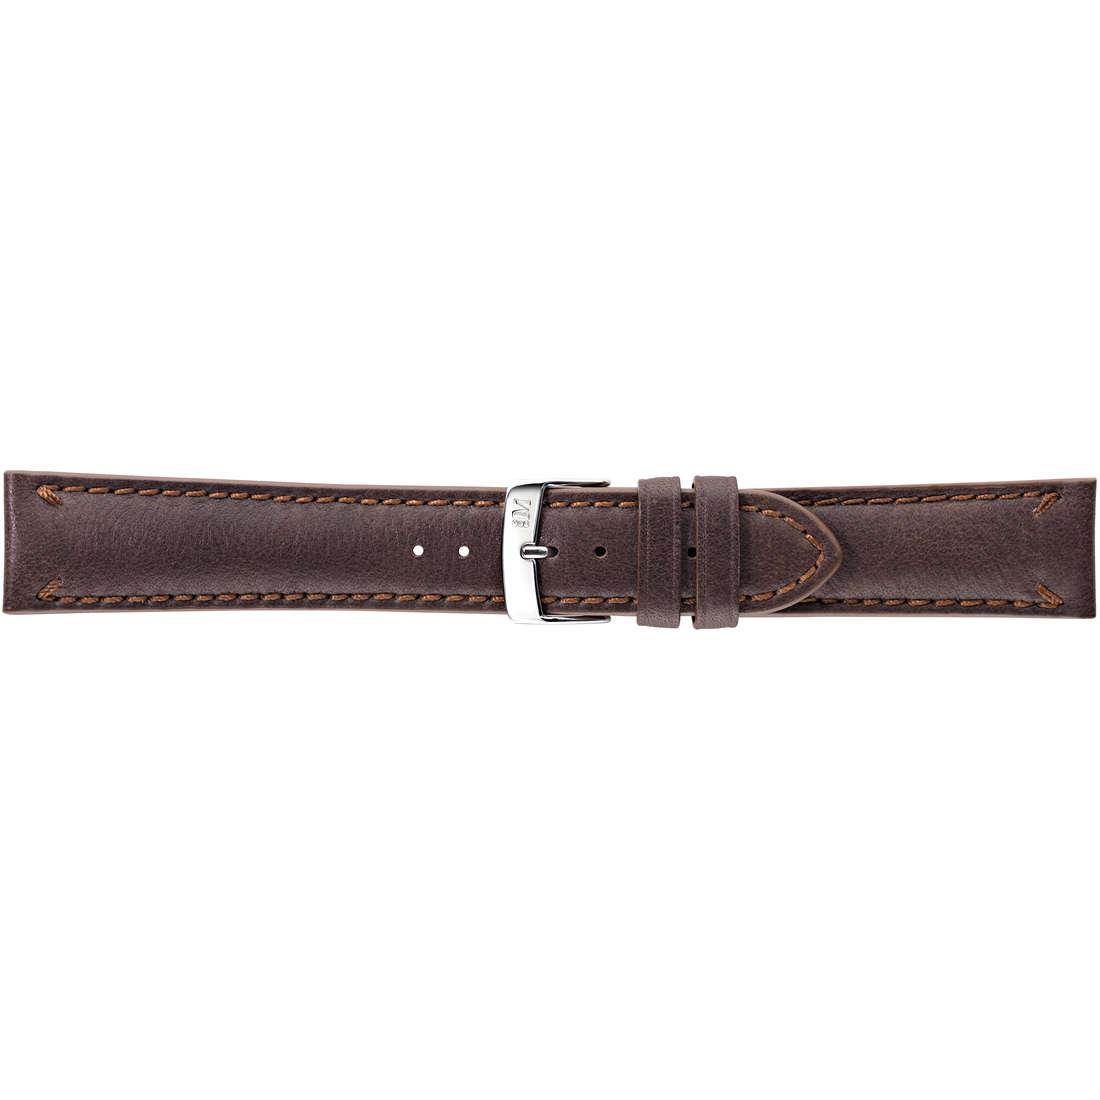 watch watch bands watch straps man Morellato Manufatti A01X4540A61030CR22